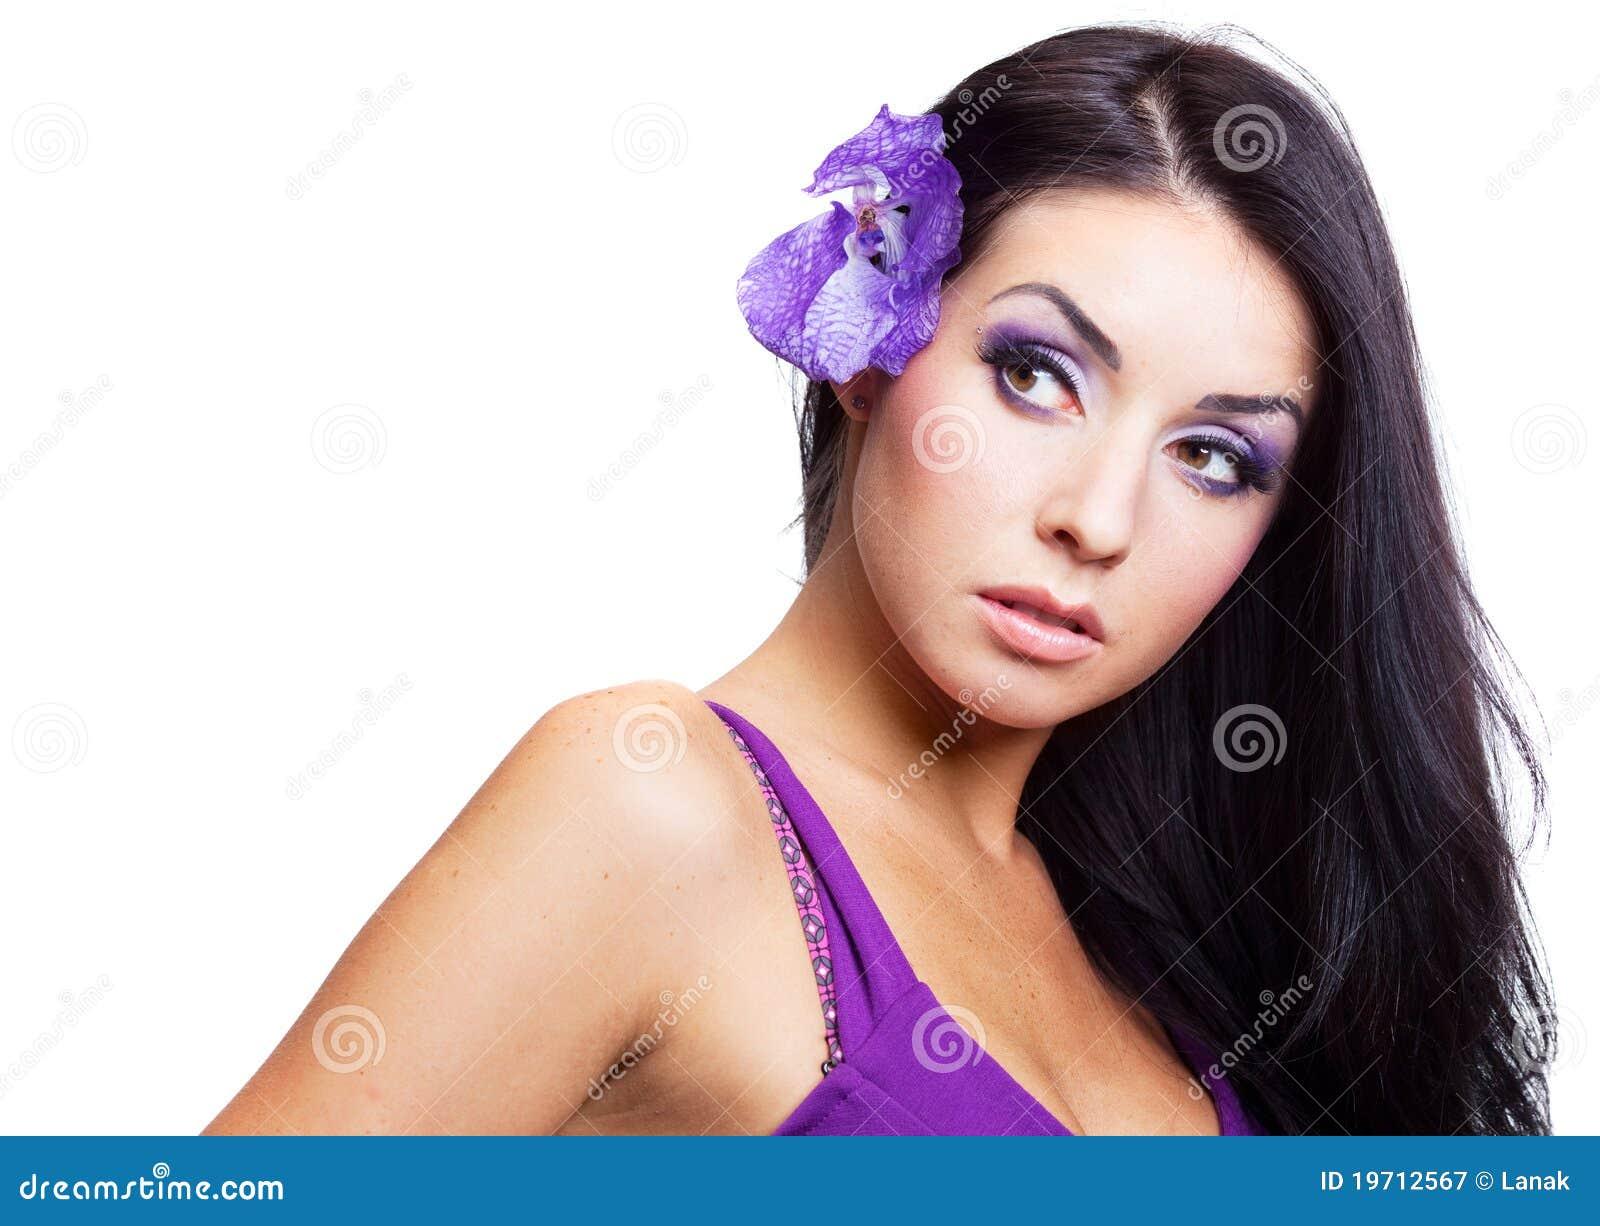 лесбиянки страпон ru15.sexxx.name — HD Porno, в